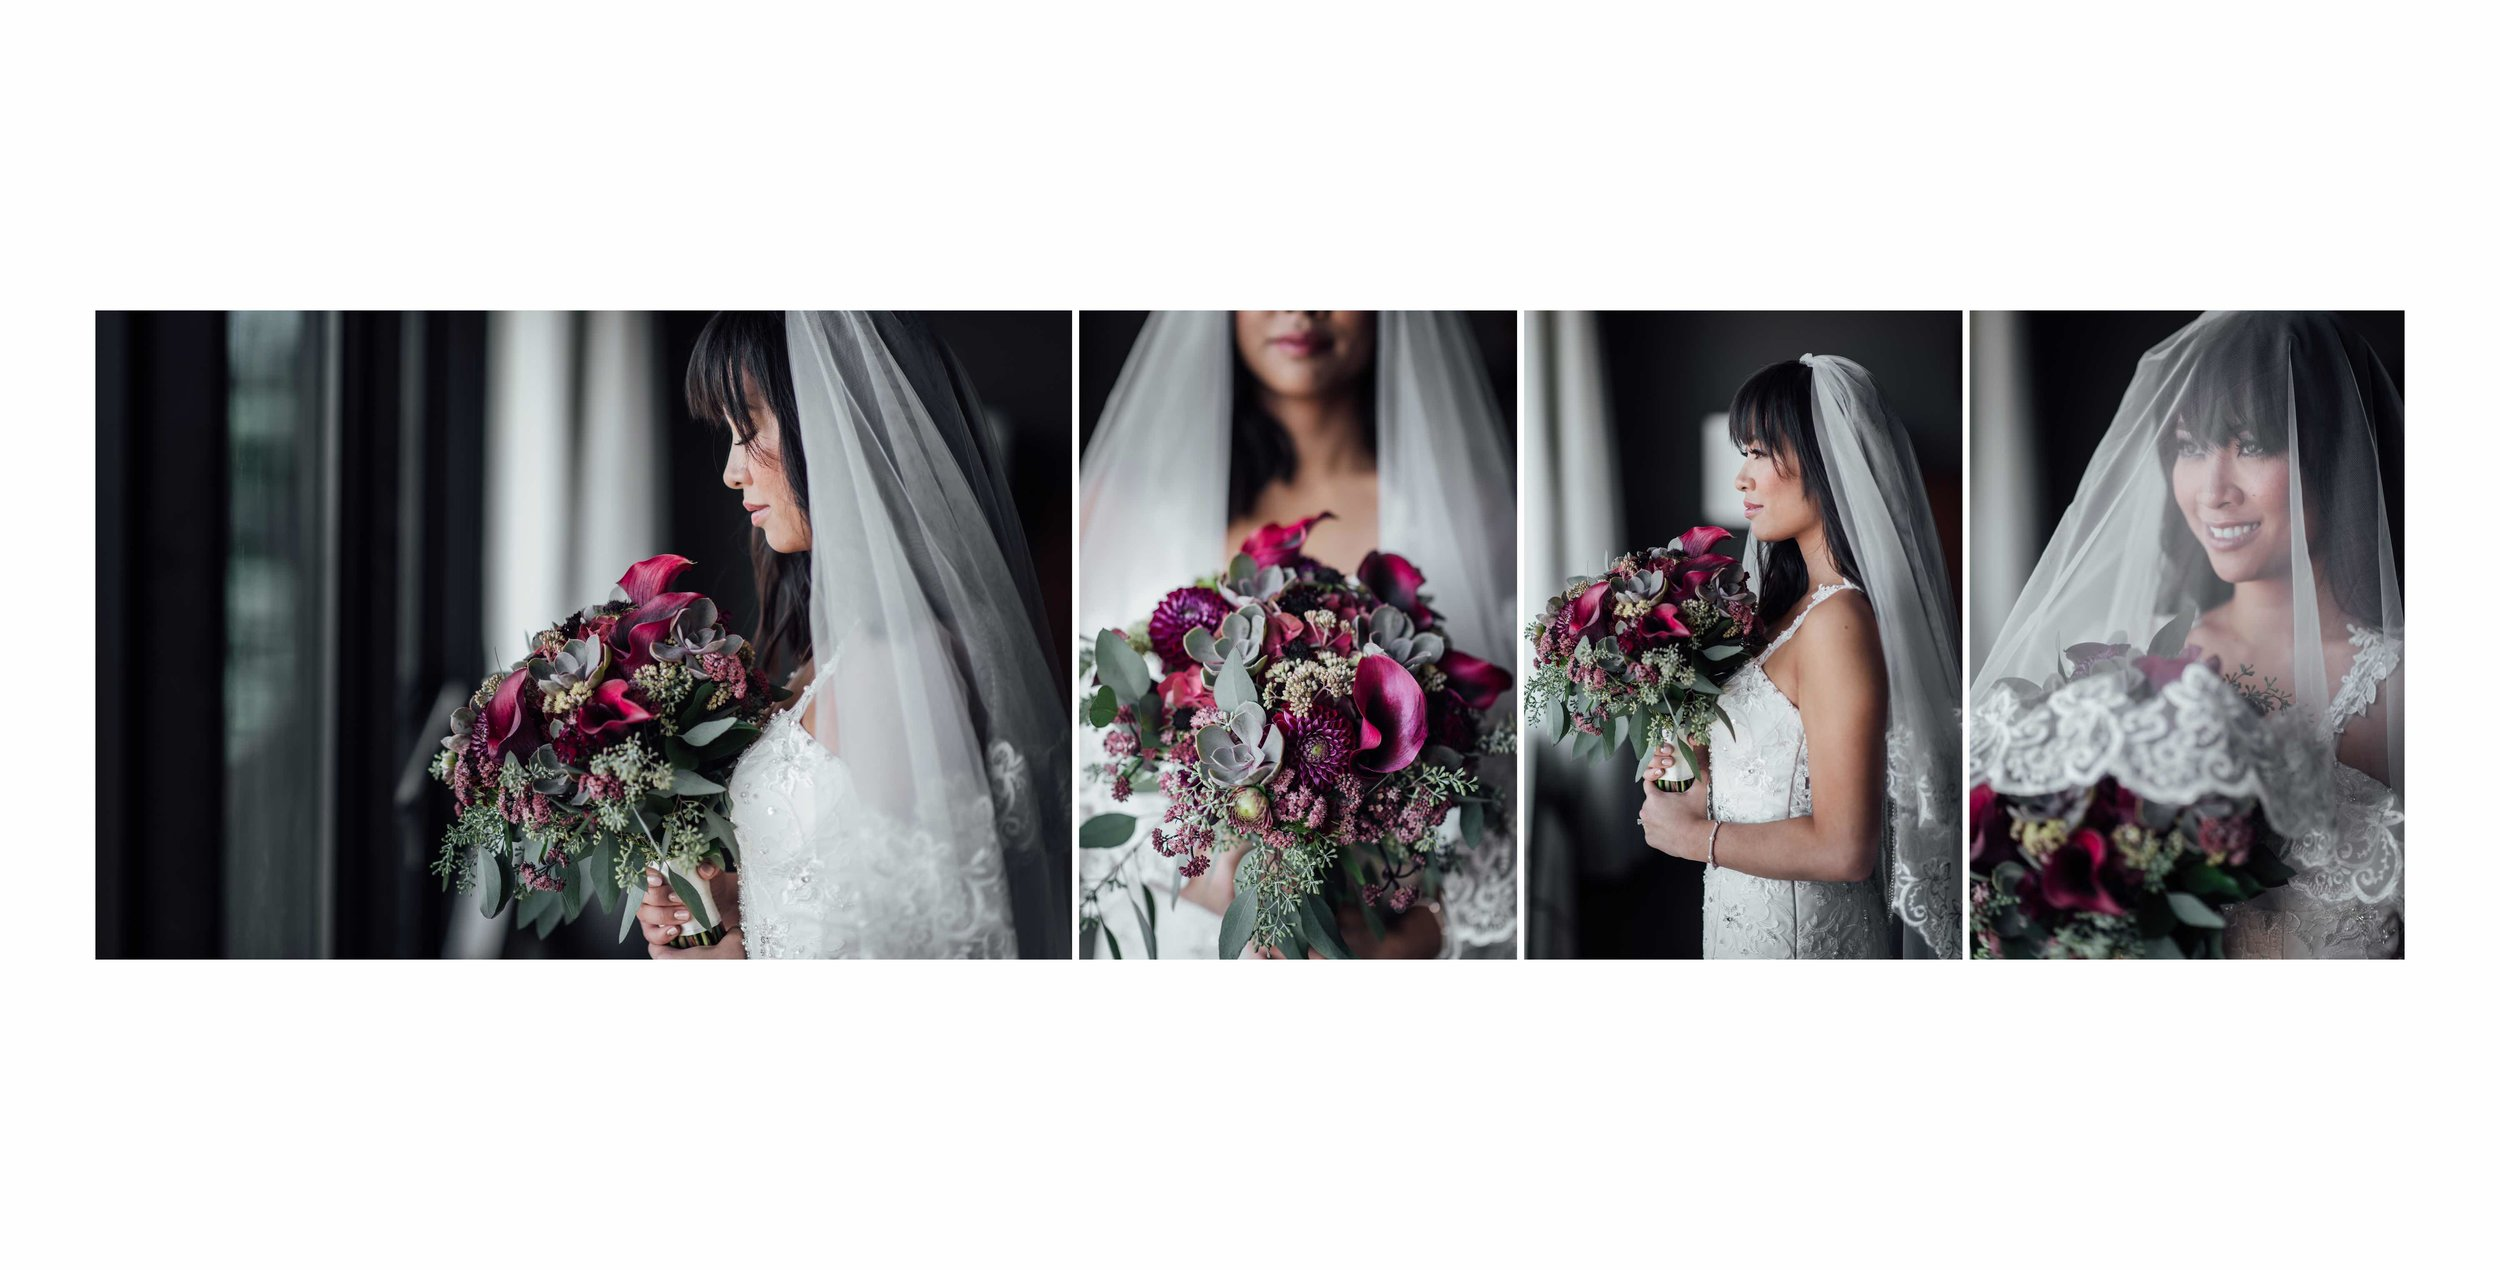 Lilianne+Minh-Quan_|_Wedding_07.jpg